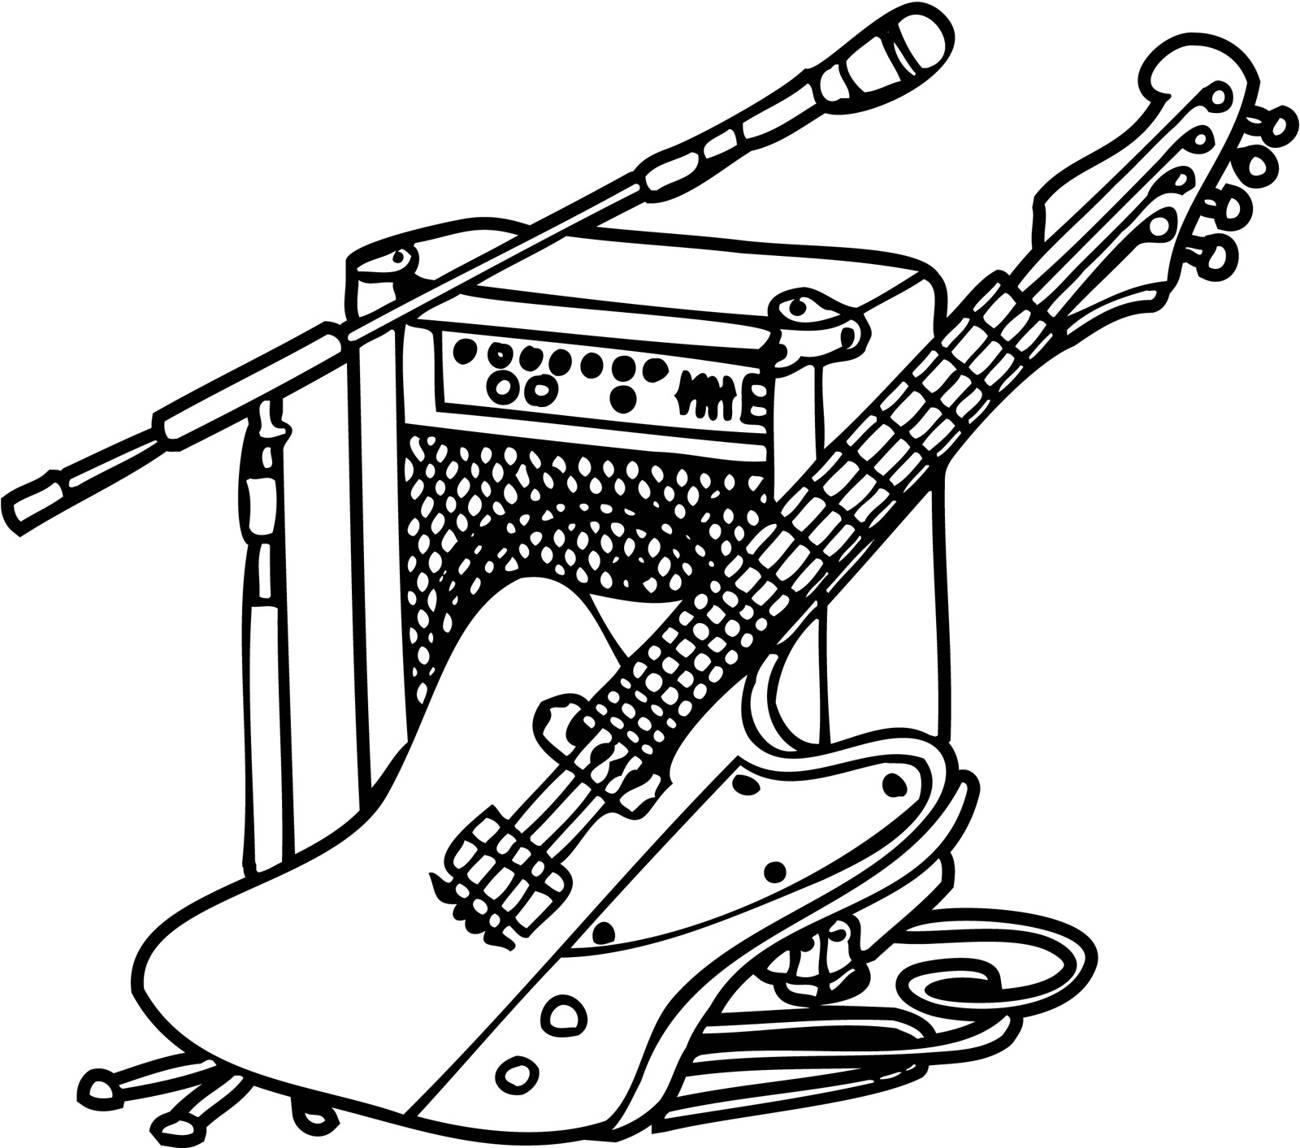 MUSIC-084